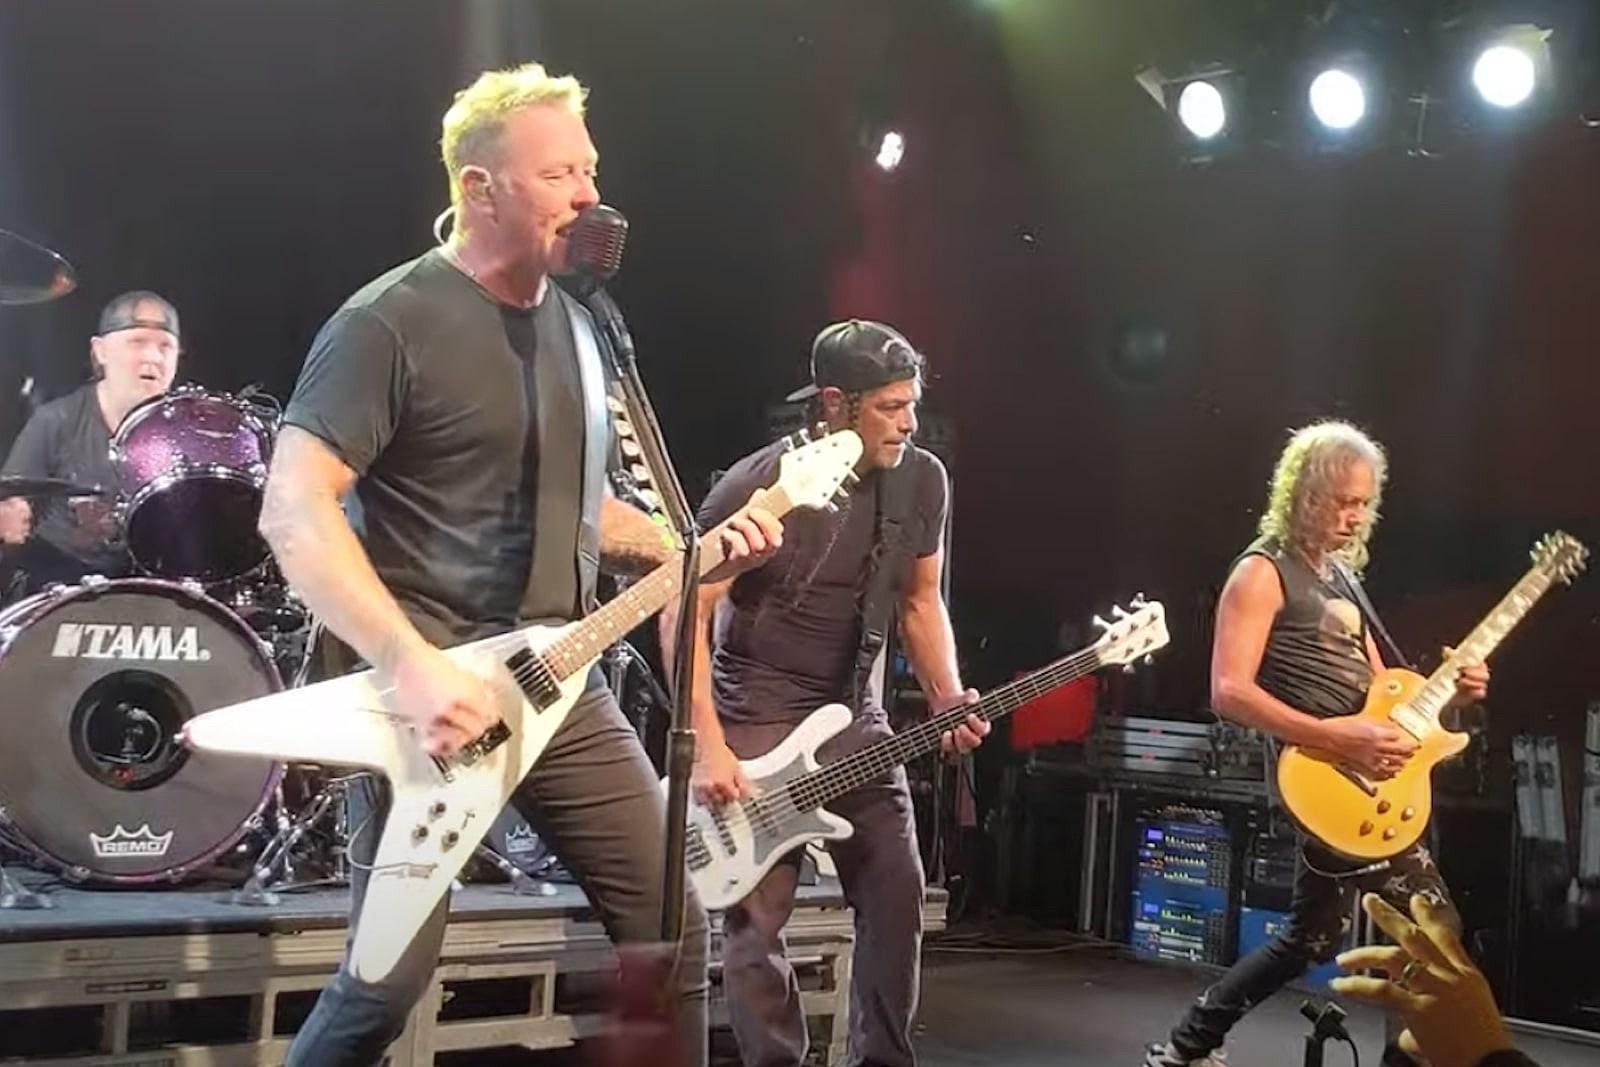 Metallica Return With Surprise Club Show: Video, Set List